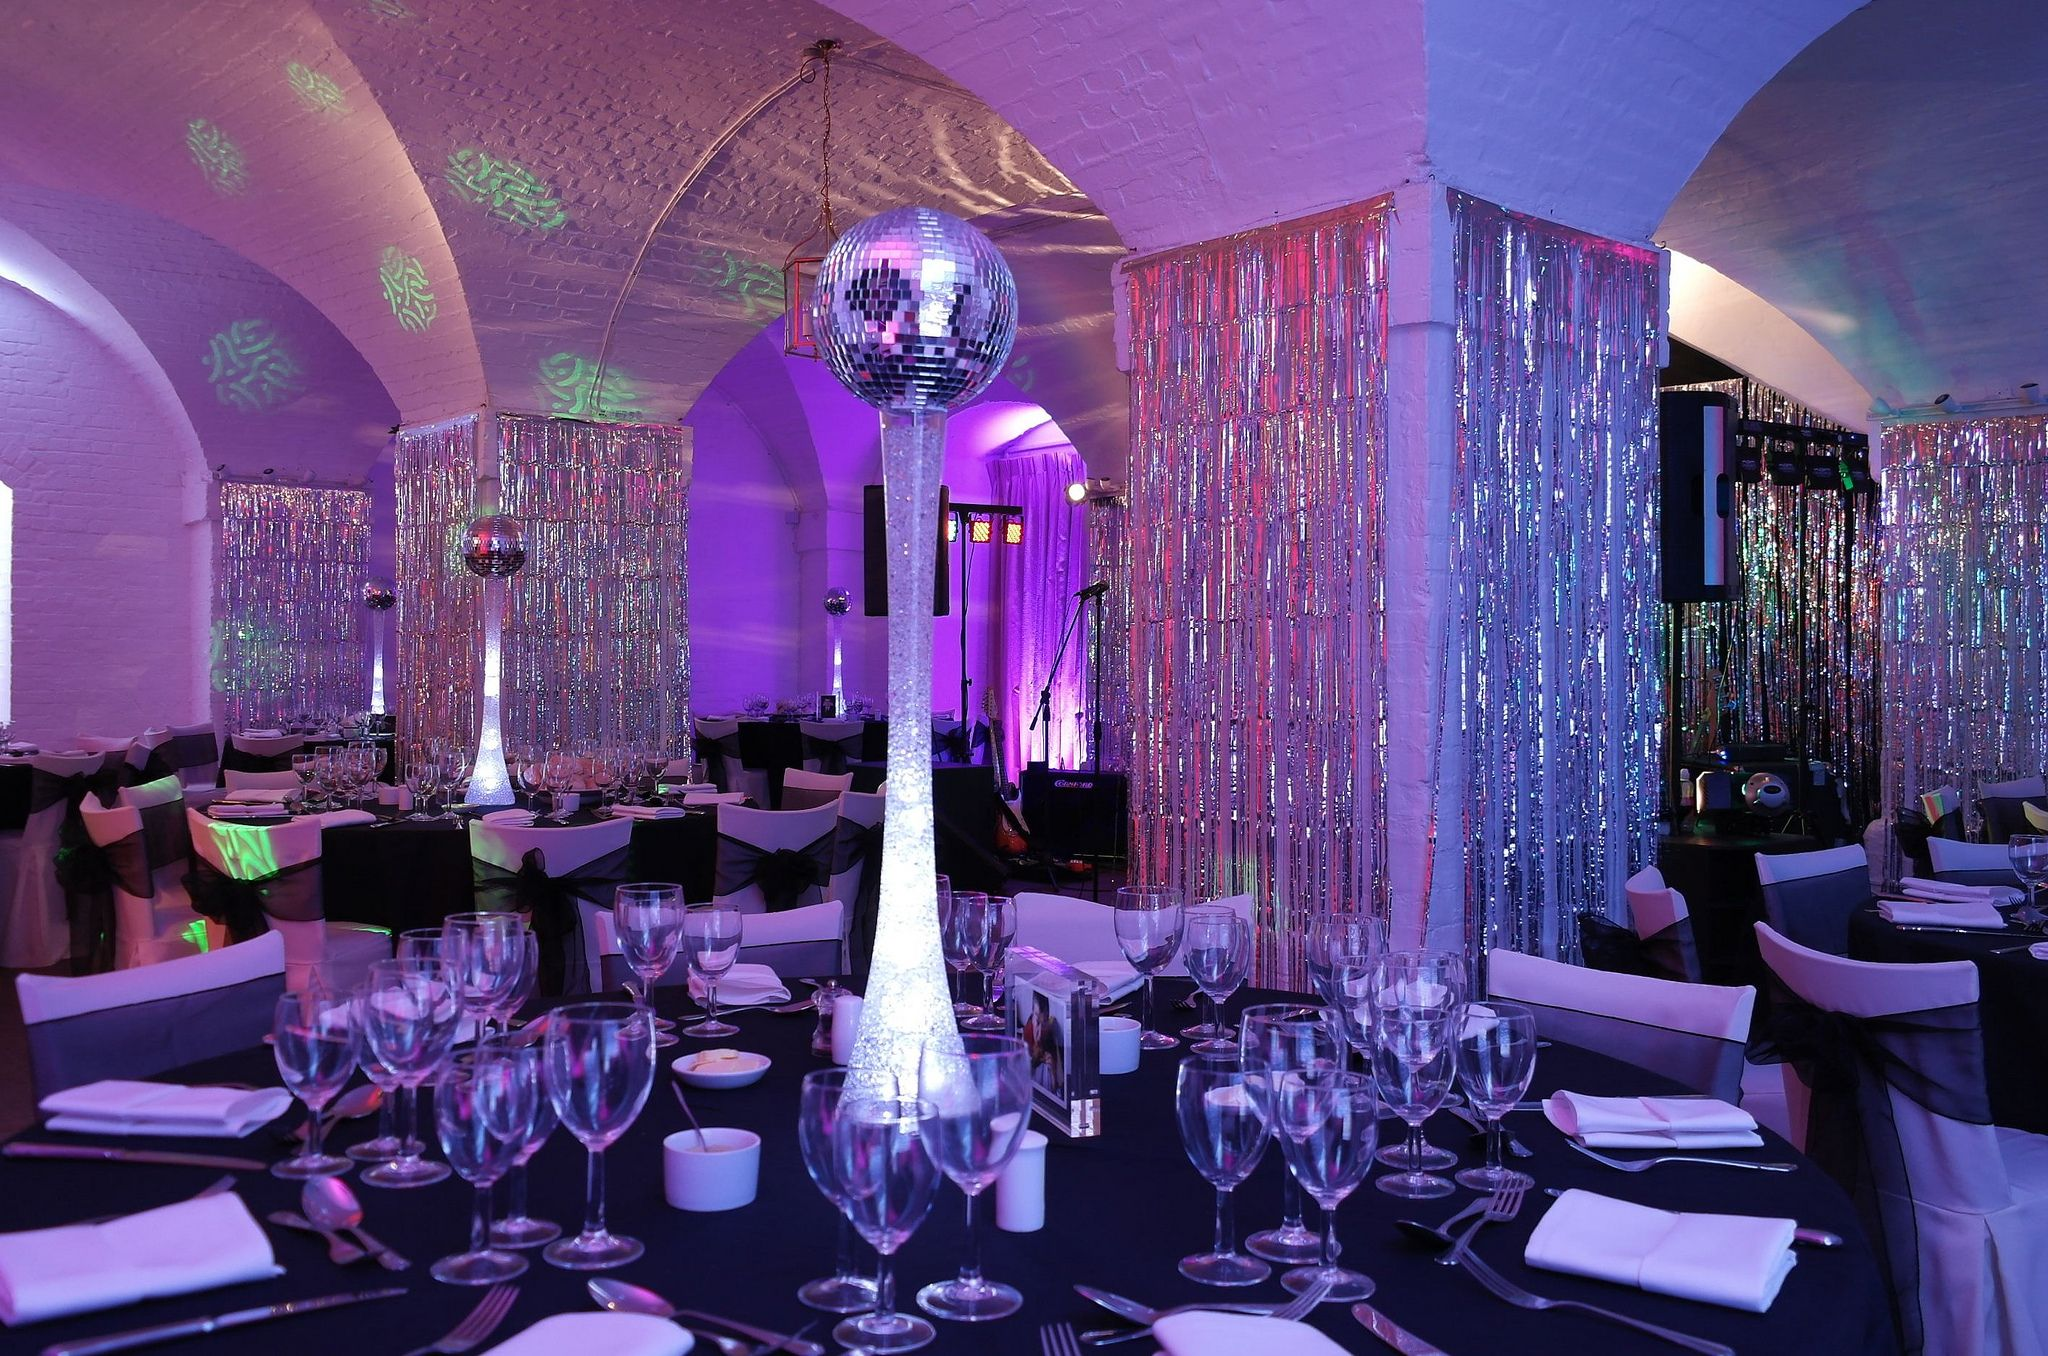 Clandon Park Surrey Shimmer curtains, illuminated mirror